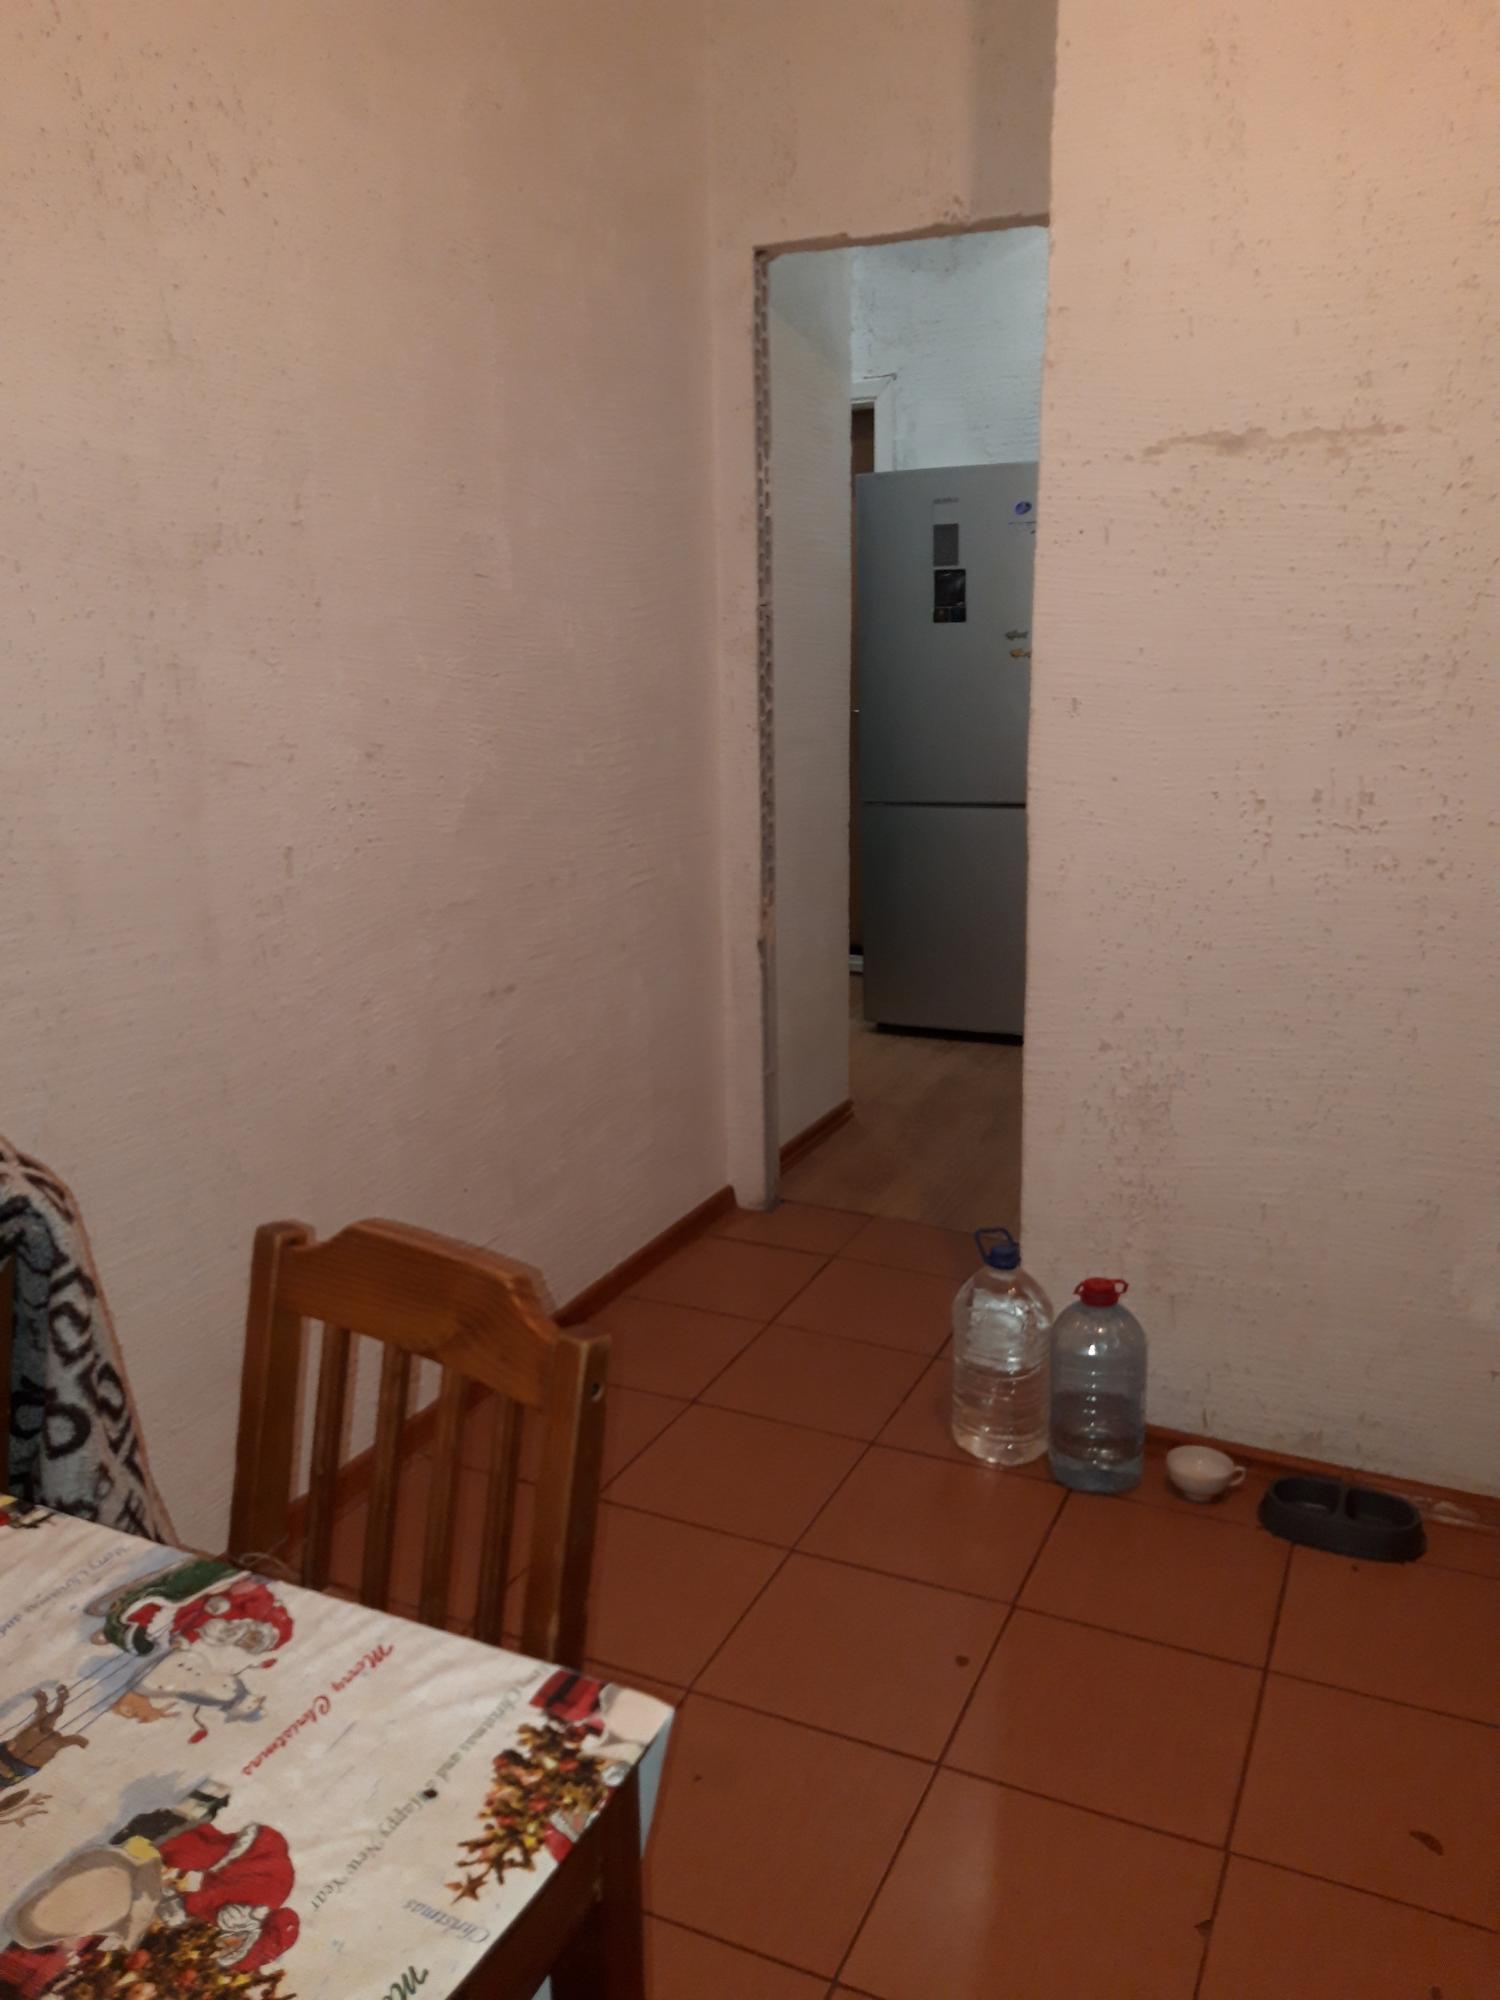 Квартира, 1 комната, 34 м² 89190284316 купить 6